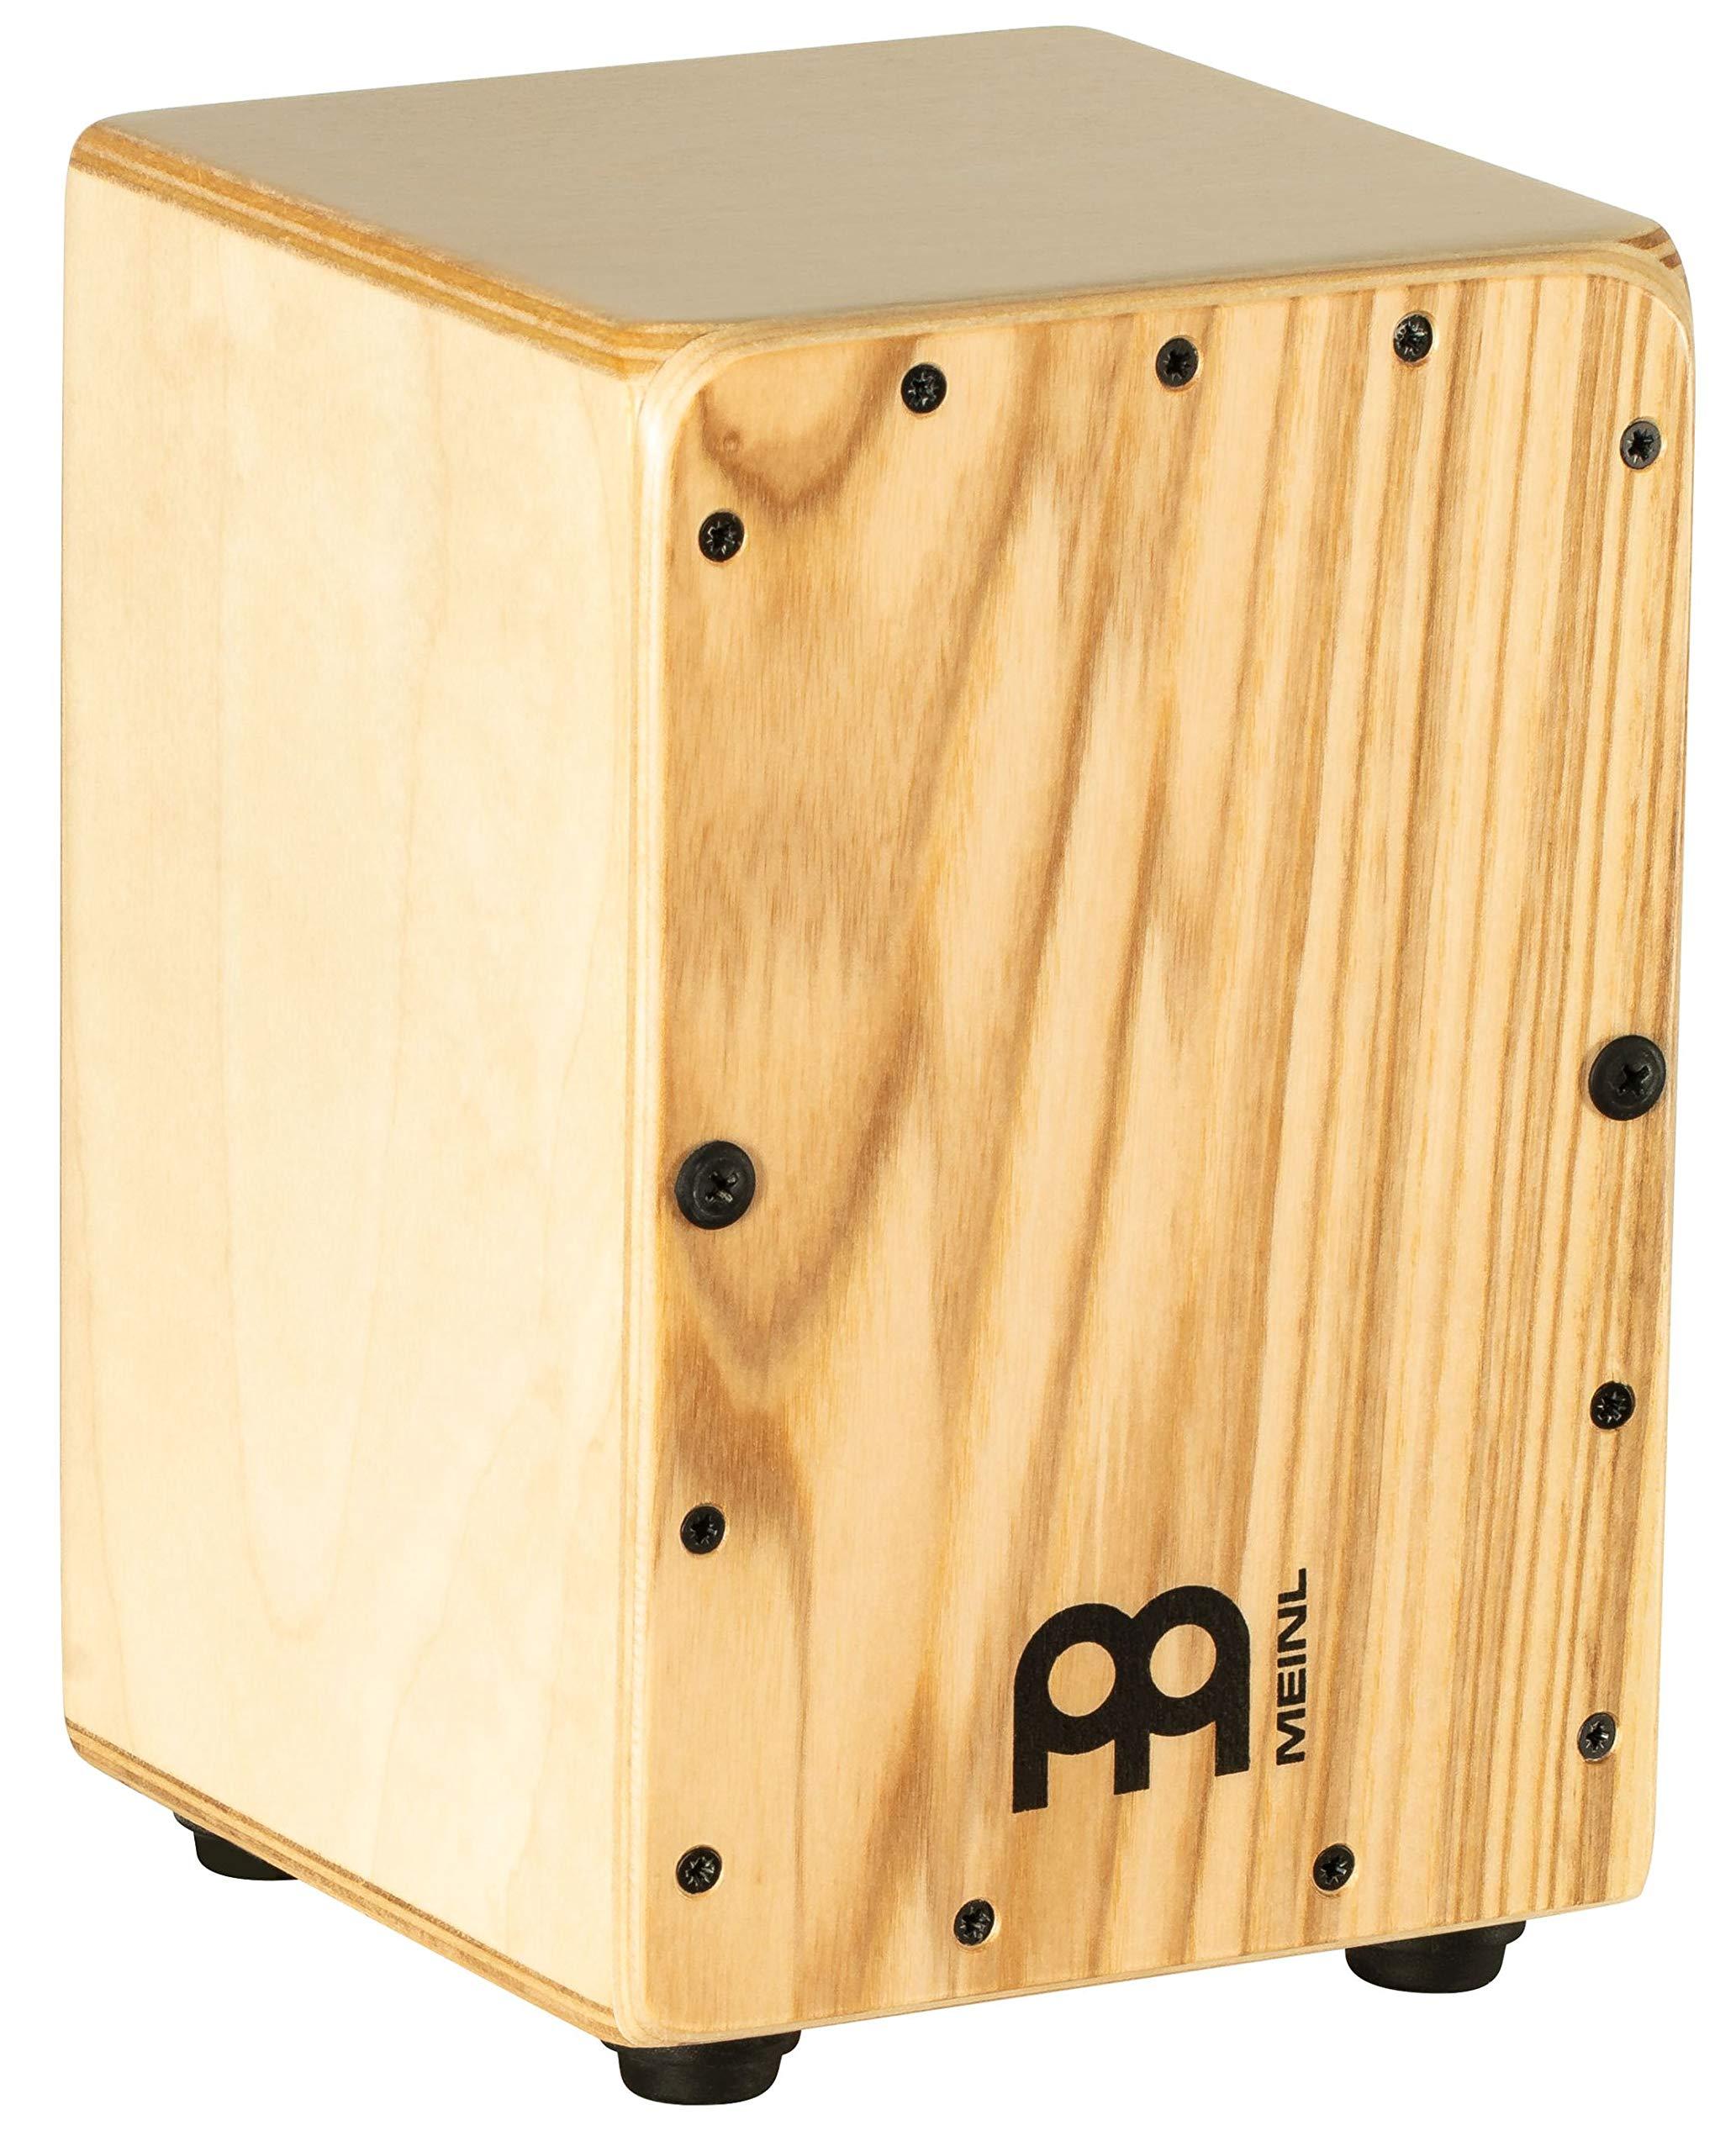 Meinl Mini Cajon Box Drum with Internal Snares - MADE IN EUROPE - Heart Ash Frontplate / Baltic Birch Body, Miniature Size,  2-YEAR WARRANTY (MC1HA) by Meinl Percussion